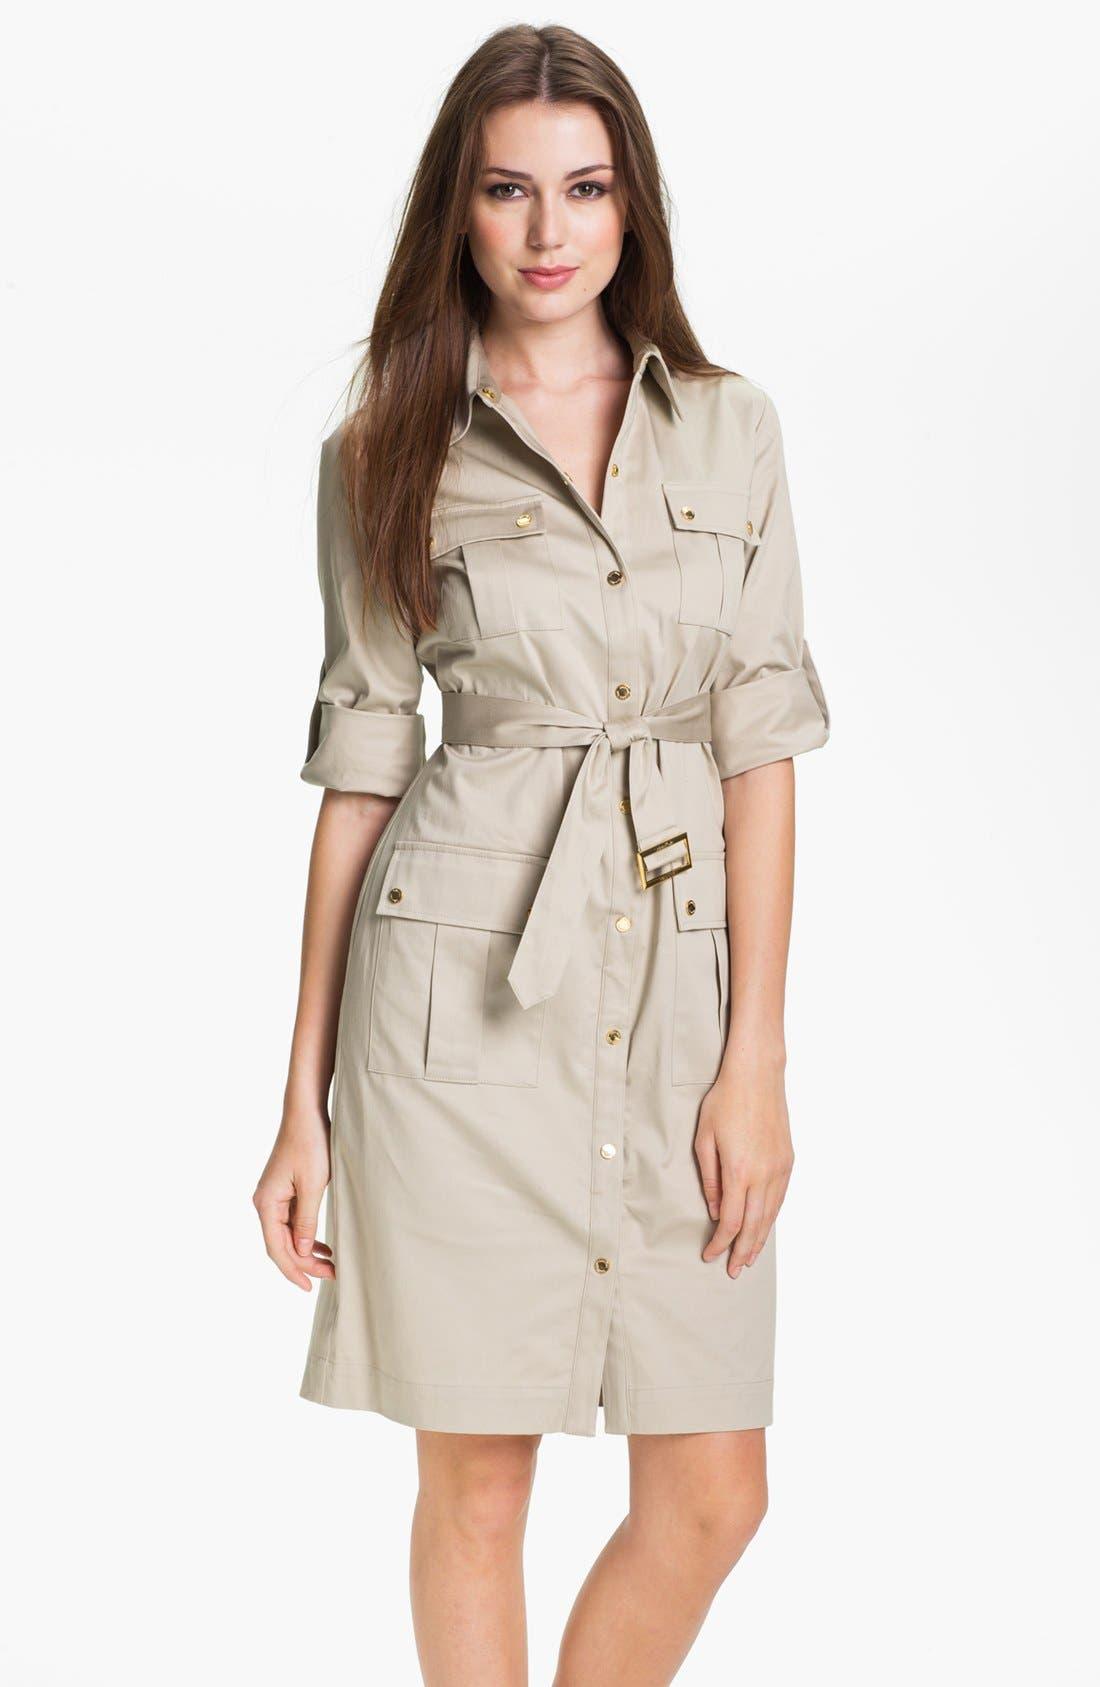 Alternate Image 1 Selected - Calvin Klein Belted Cotton Shirtdress (Petite)